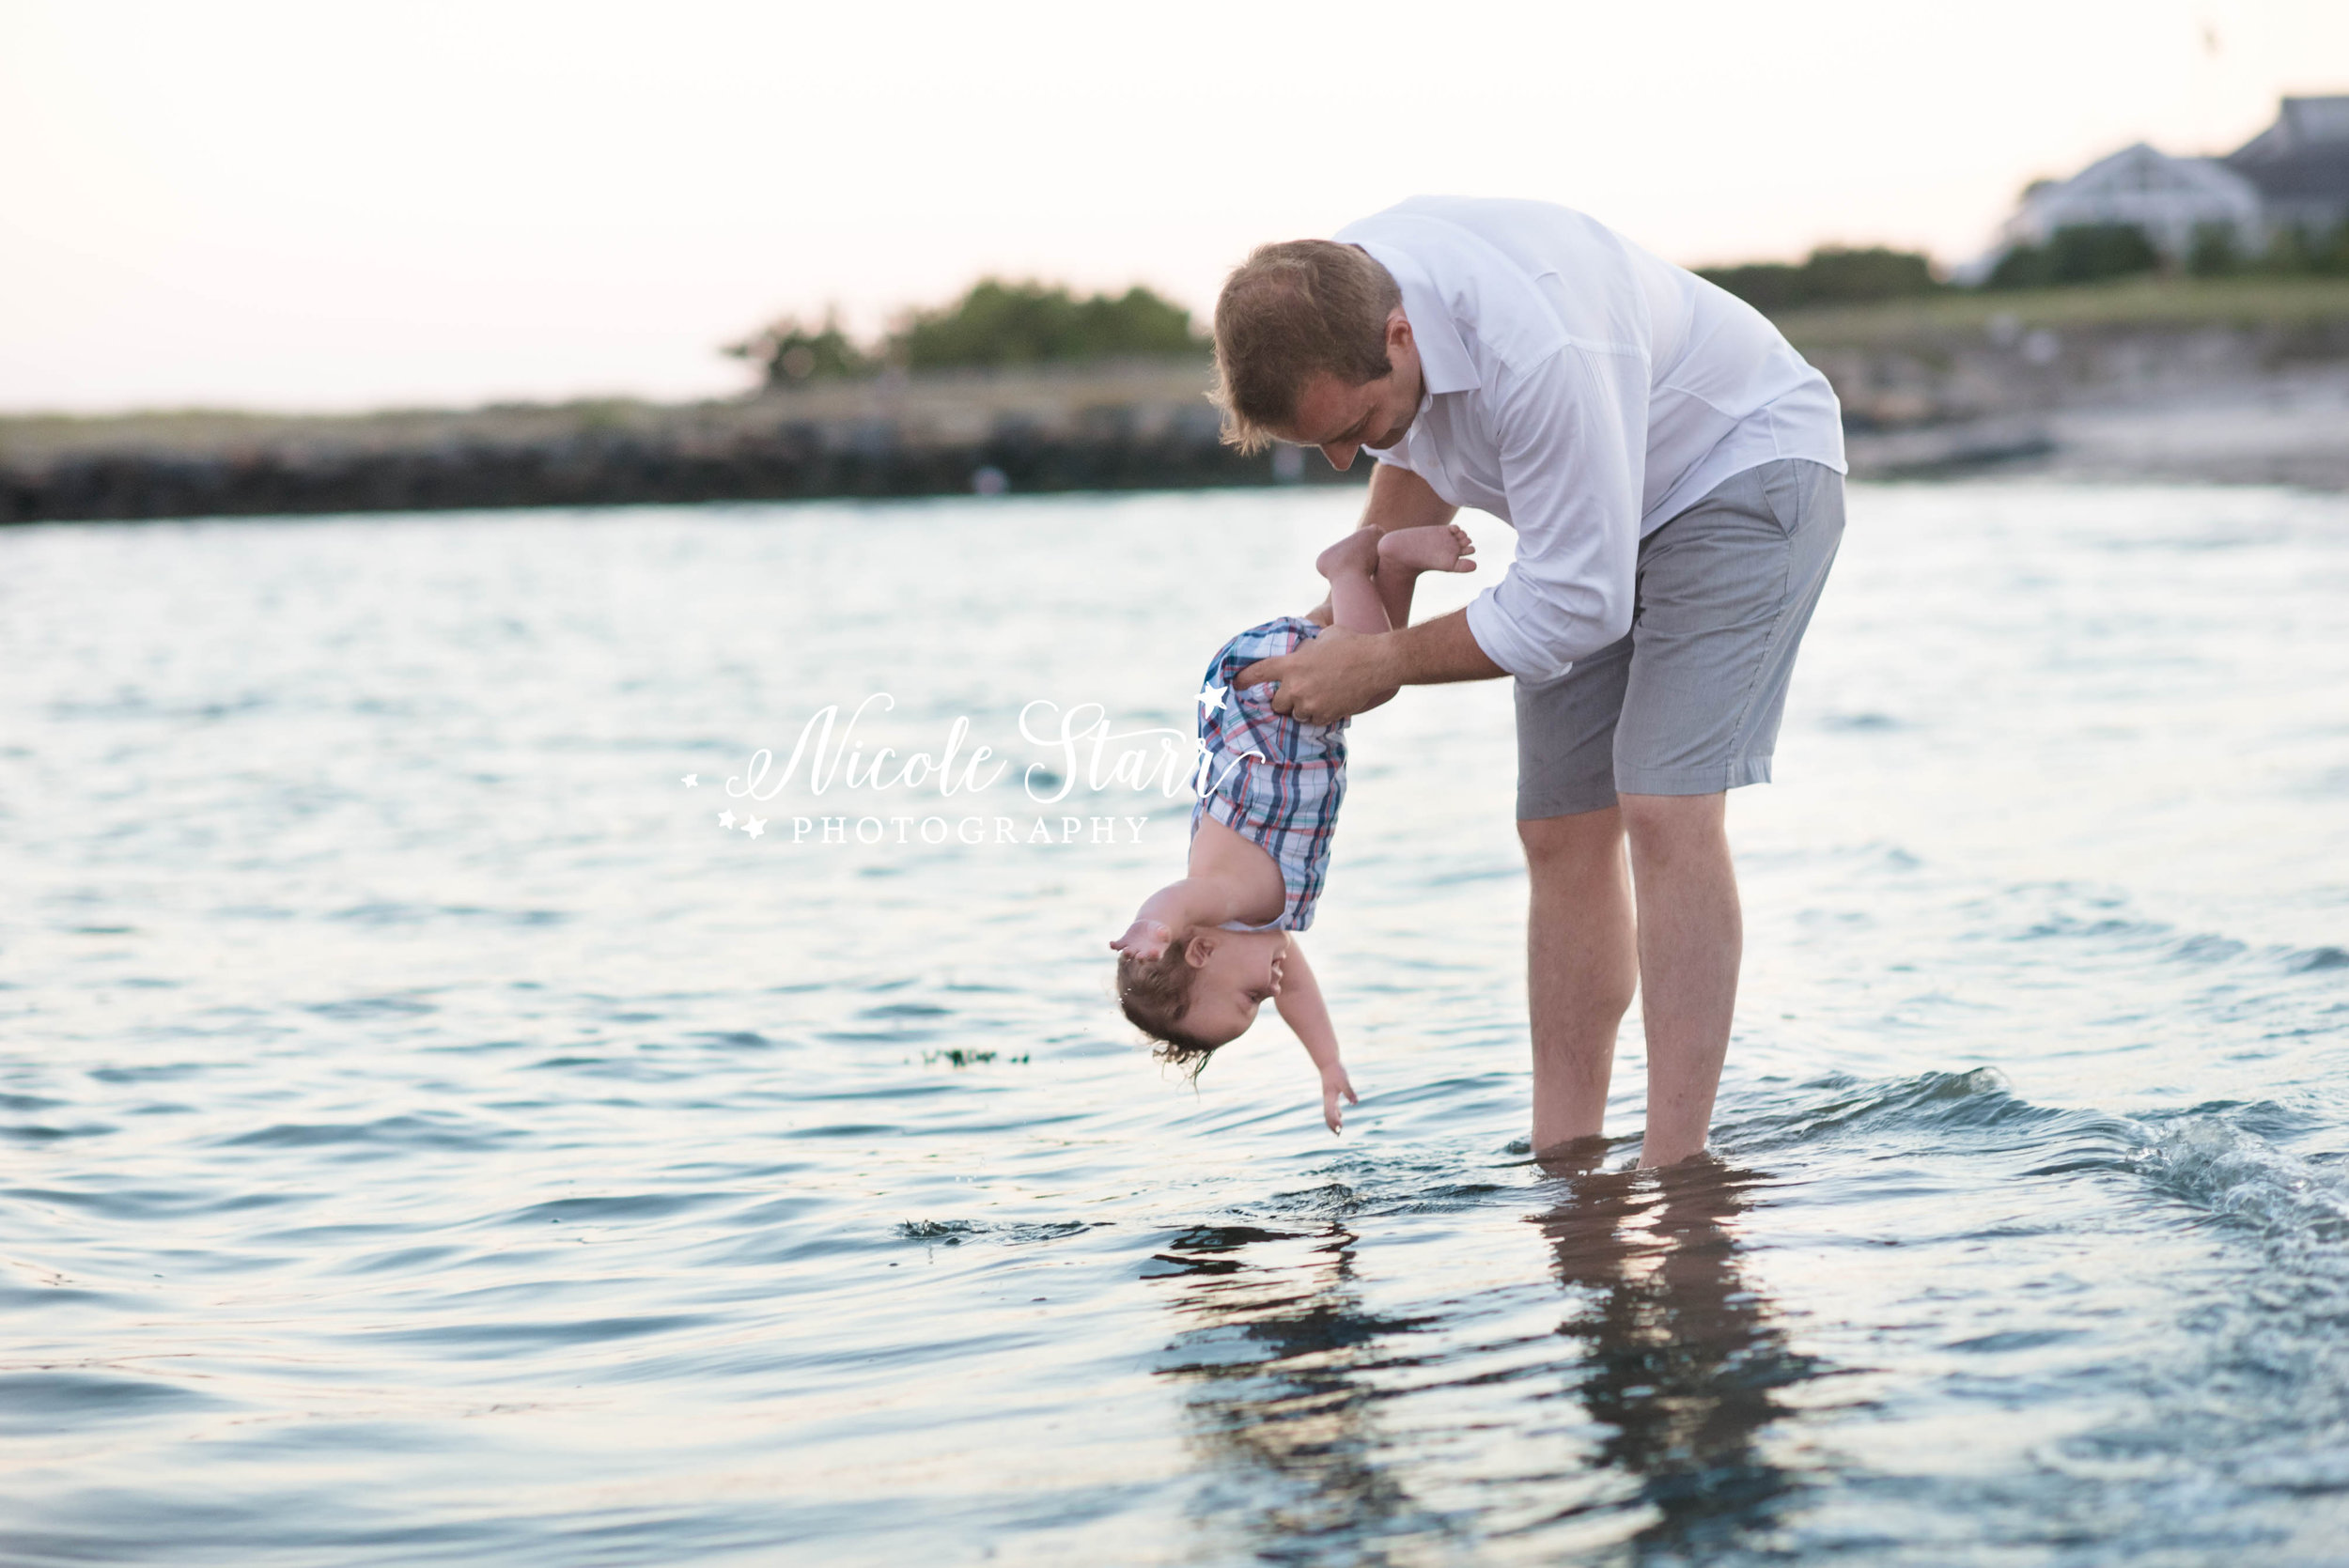 Nicole Starr Photography | Saratoga Springs Family Photographer | Boston Family Photographer | Upstate NY Family Photographer | Family Photographer | Fatherhood Photographer